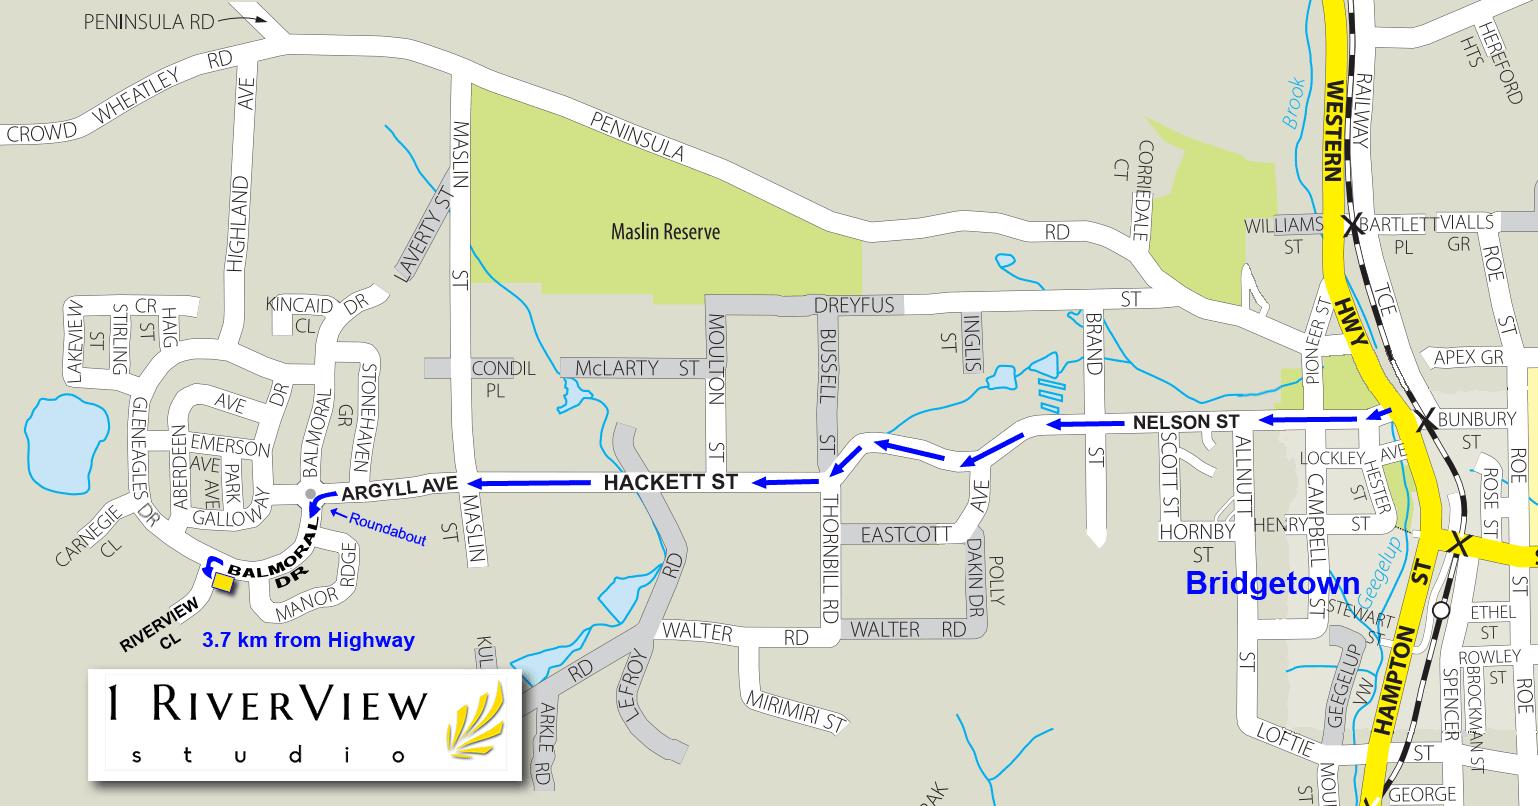 1RiverView Studio Location Map